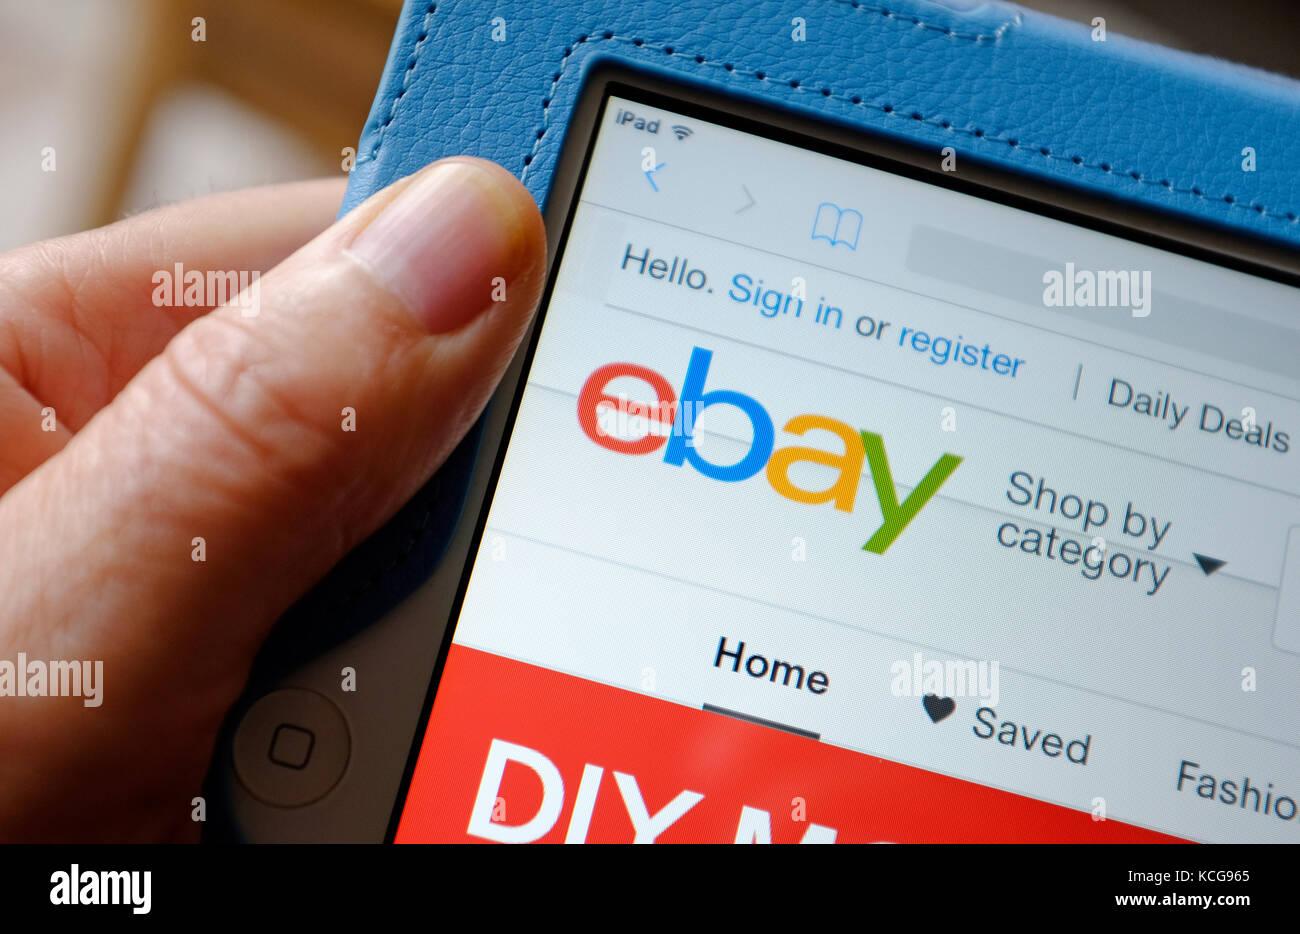 ebay logo on ipad tablet computer screen - Stock Image